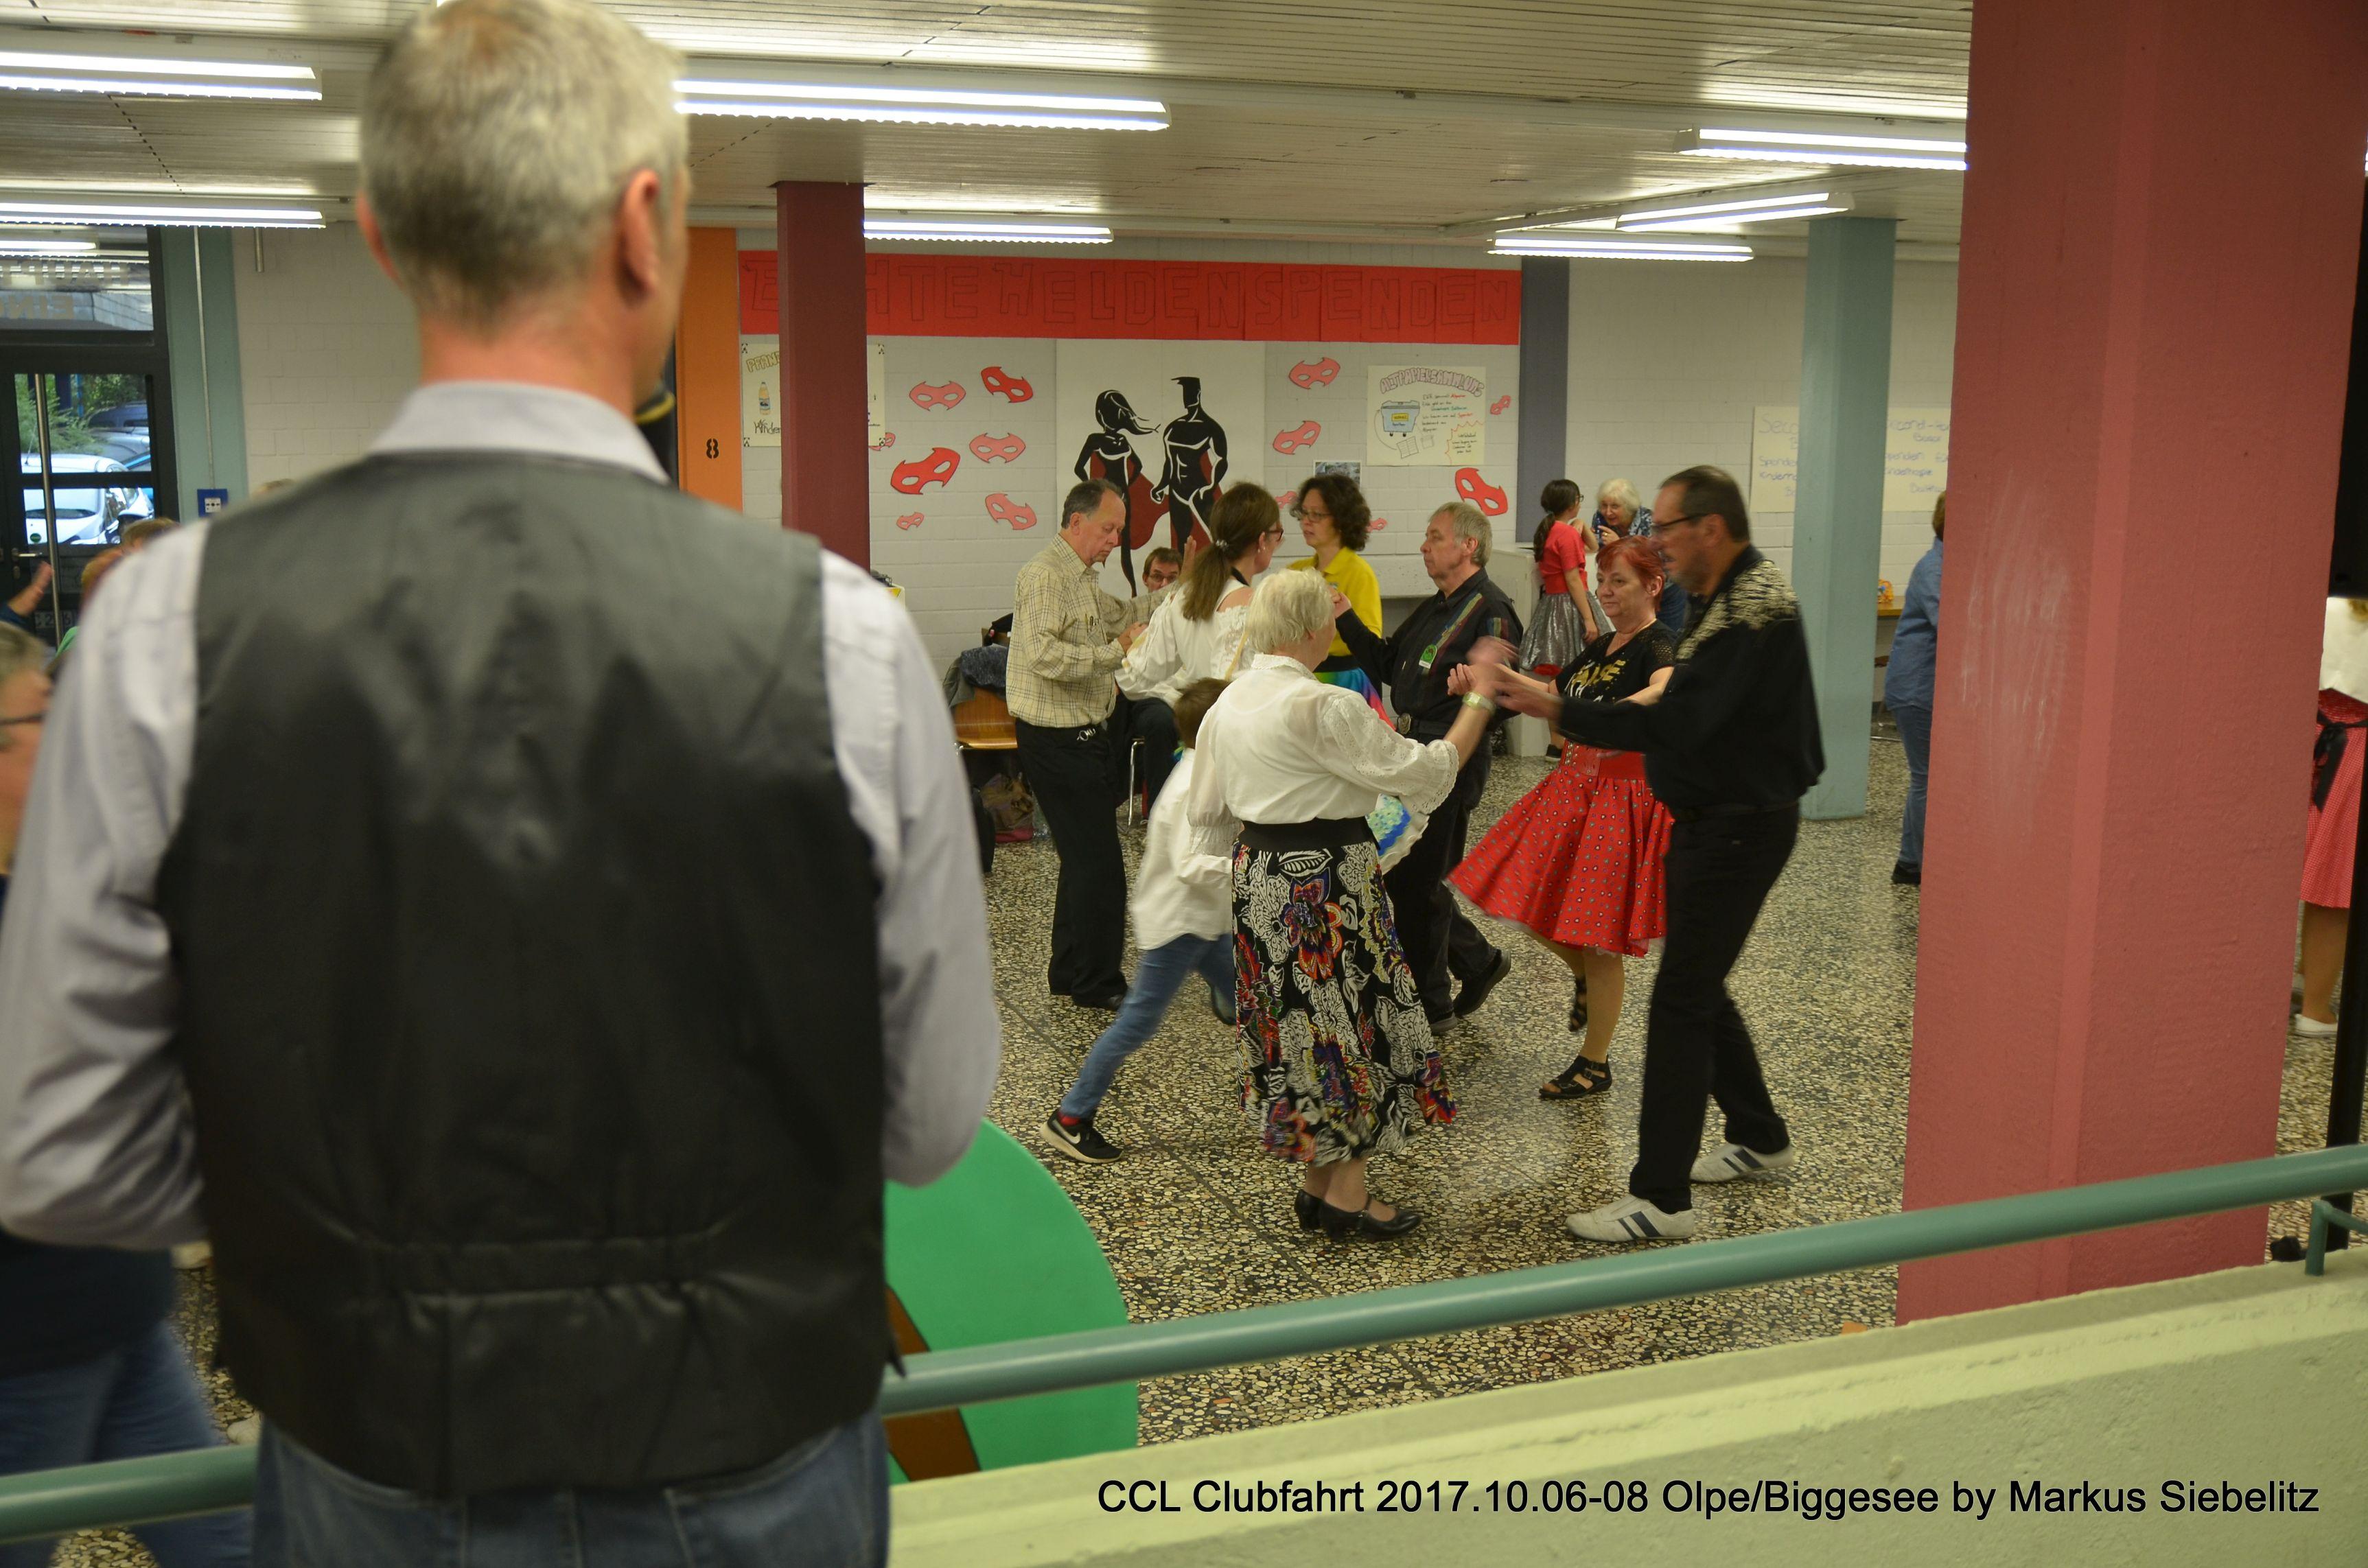 CCL Clubfahrt 2017.10.06-08 Biggesee (37)